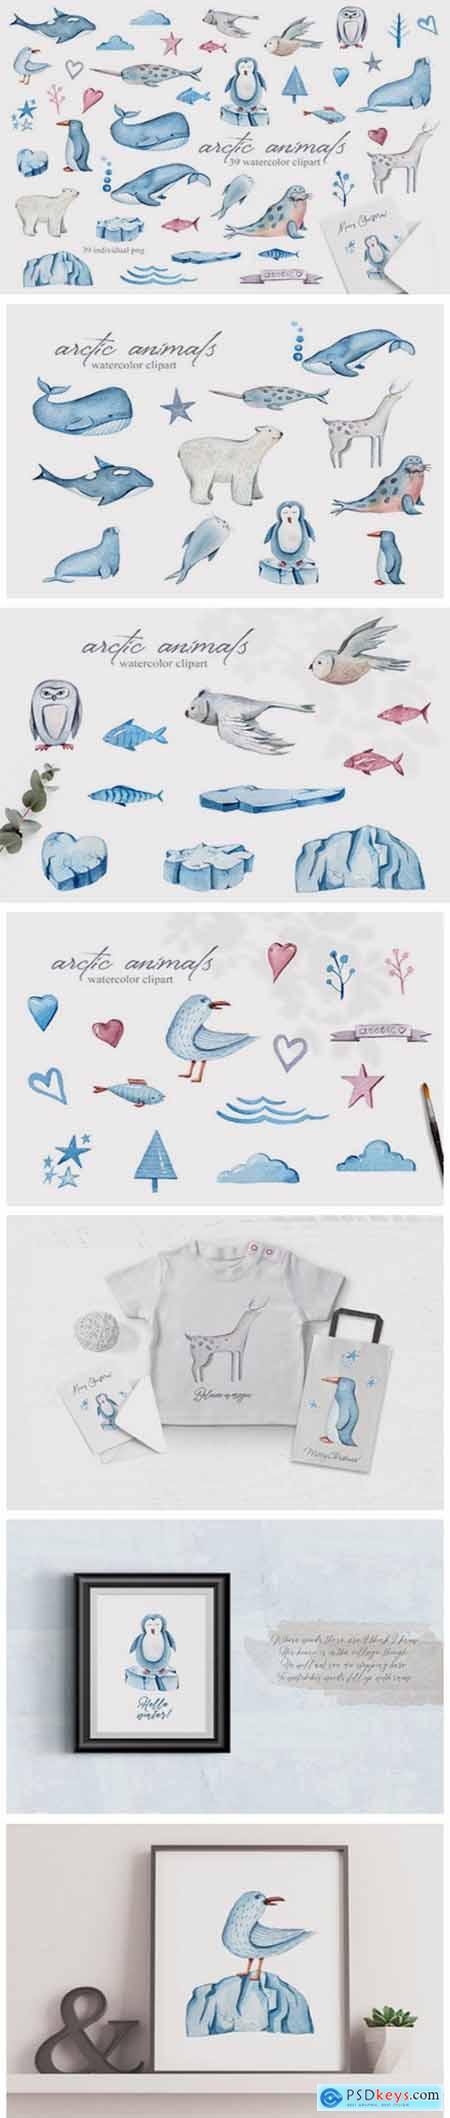 Watercolor Arctic Animals Clipart 7187574